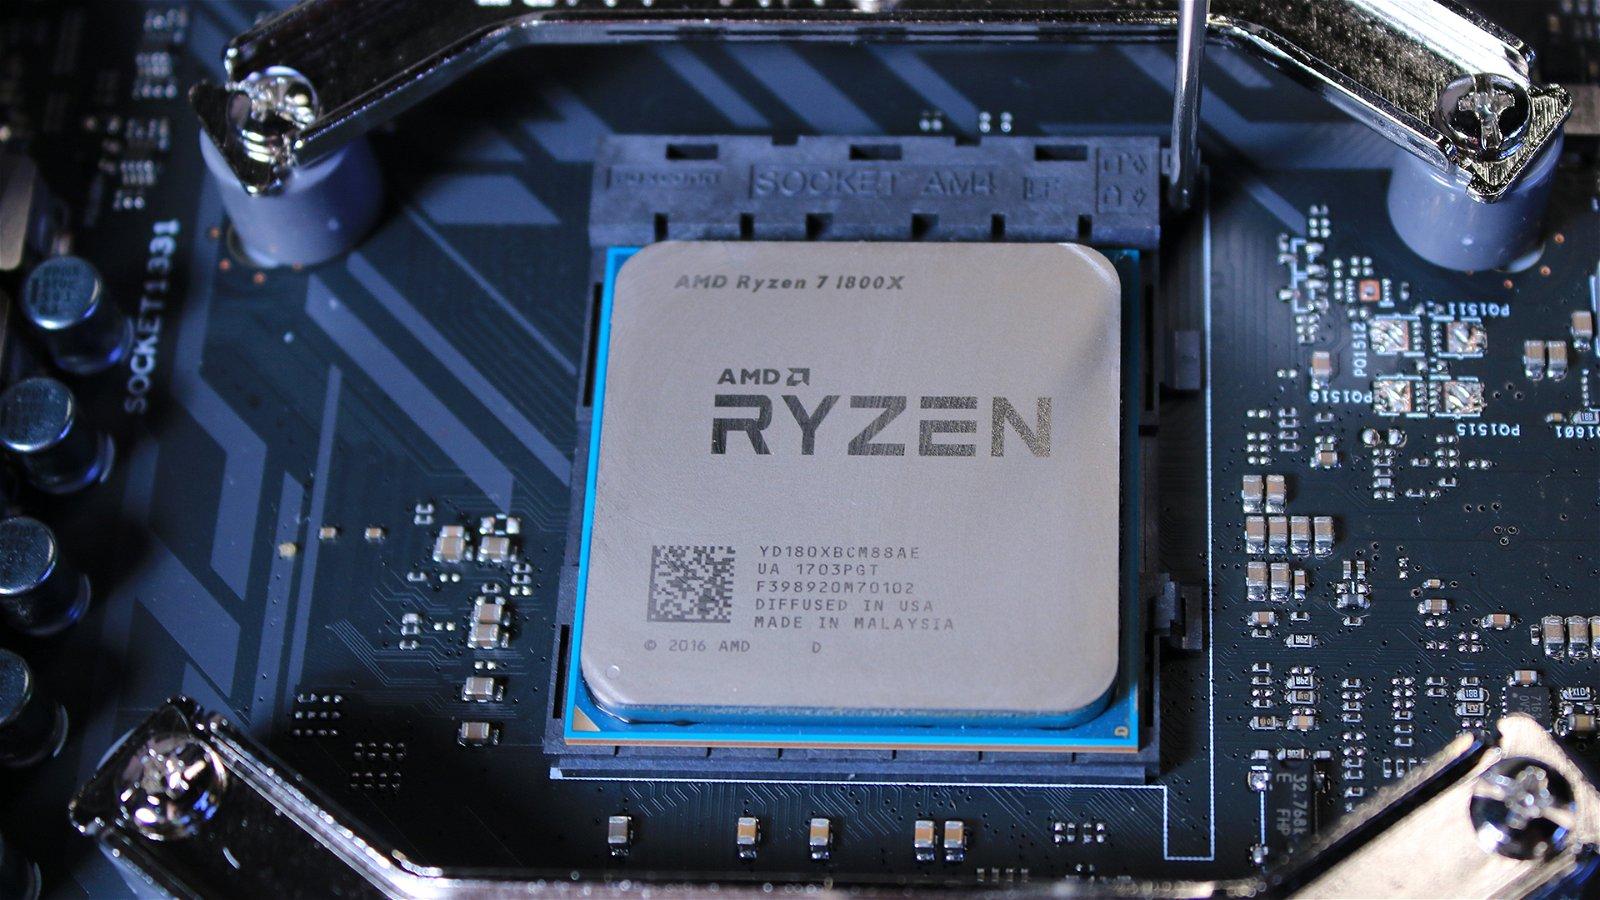 Amd Ryzen 7 1800X (Hardware) Review 4